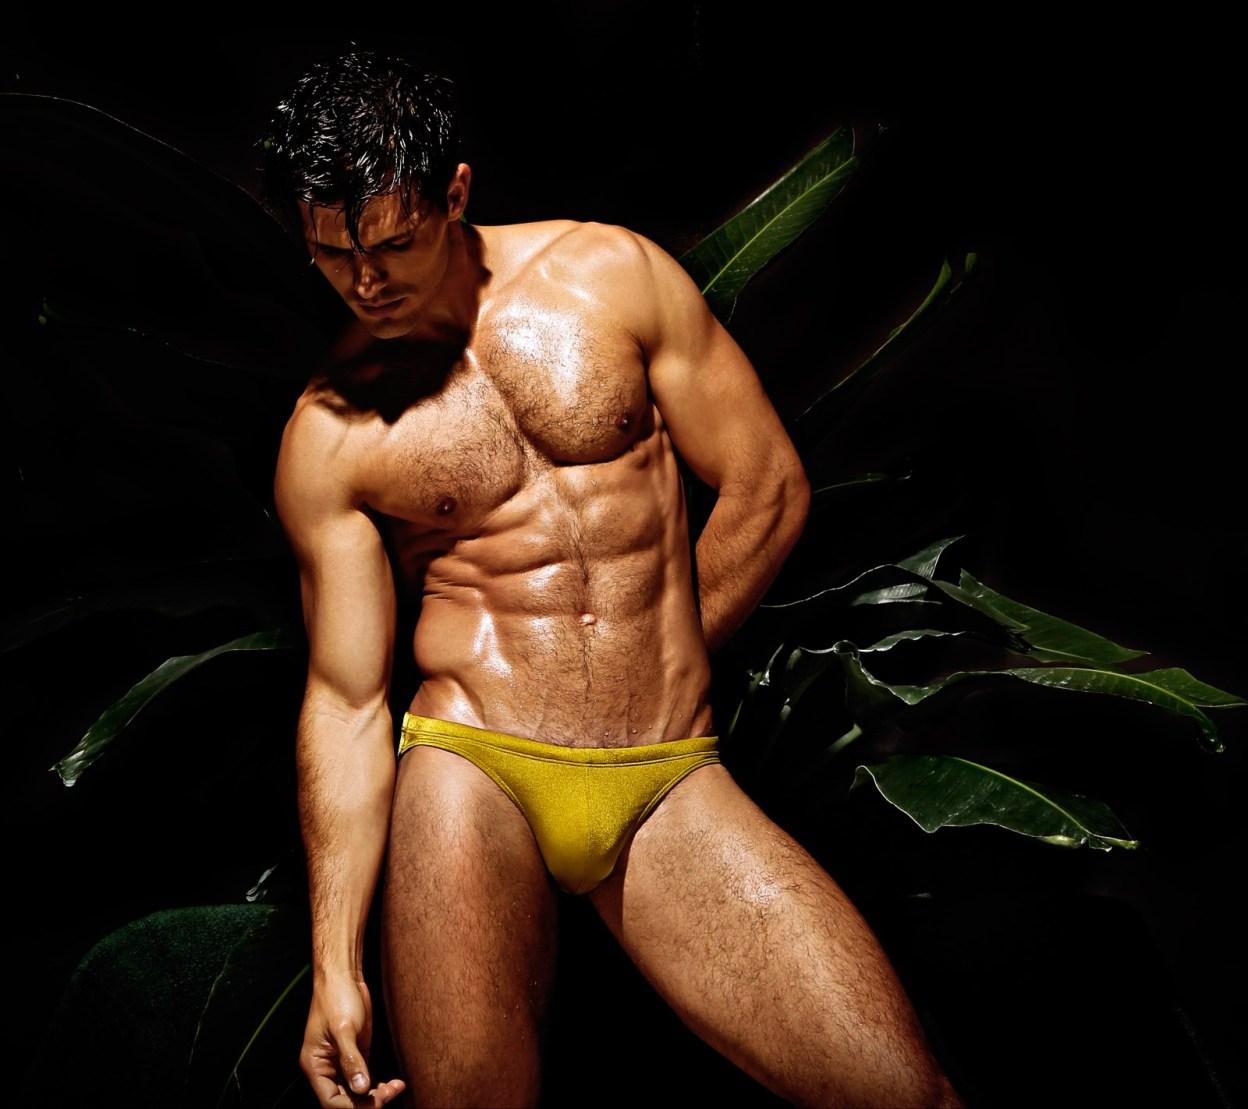 charlie by matthew zink resort speedo male model